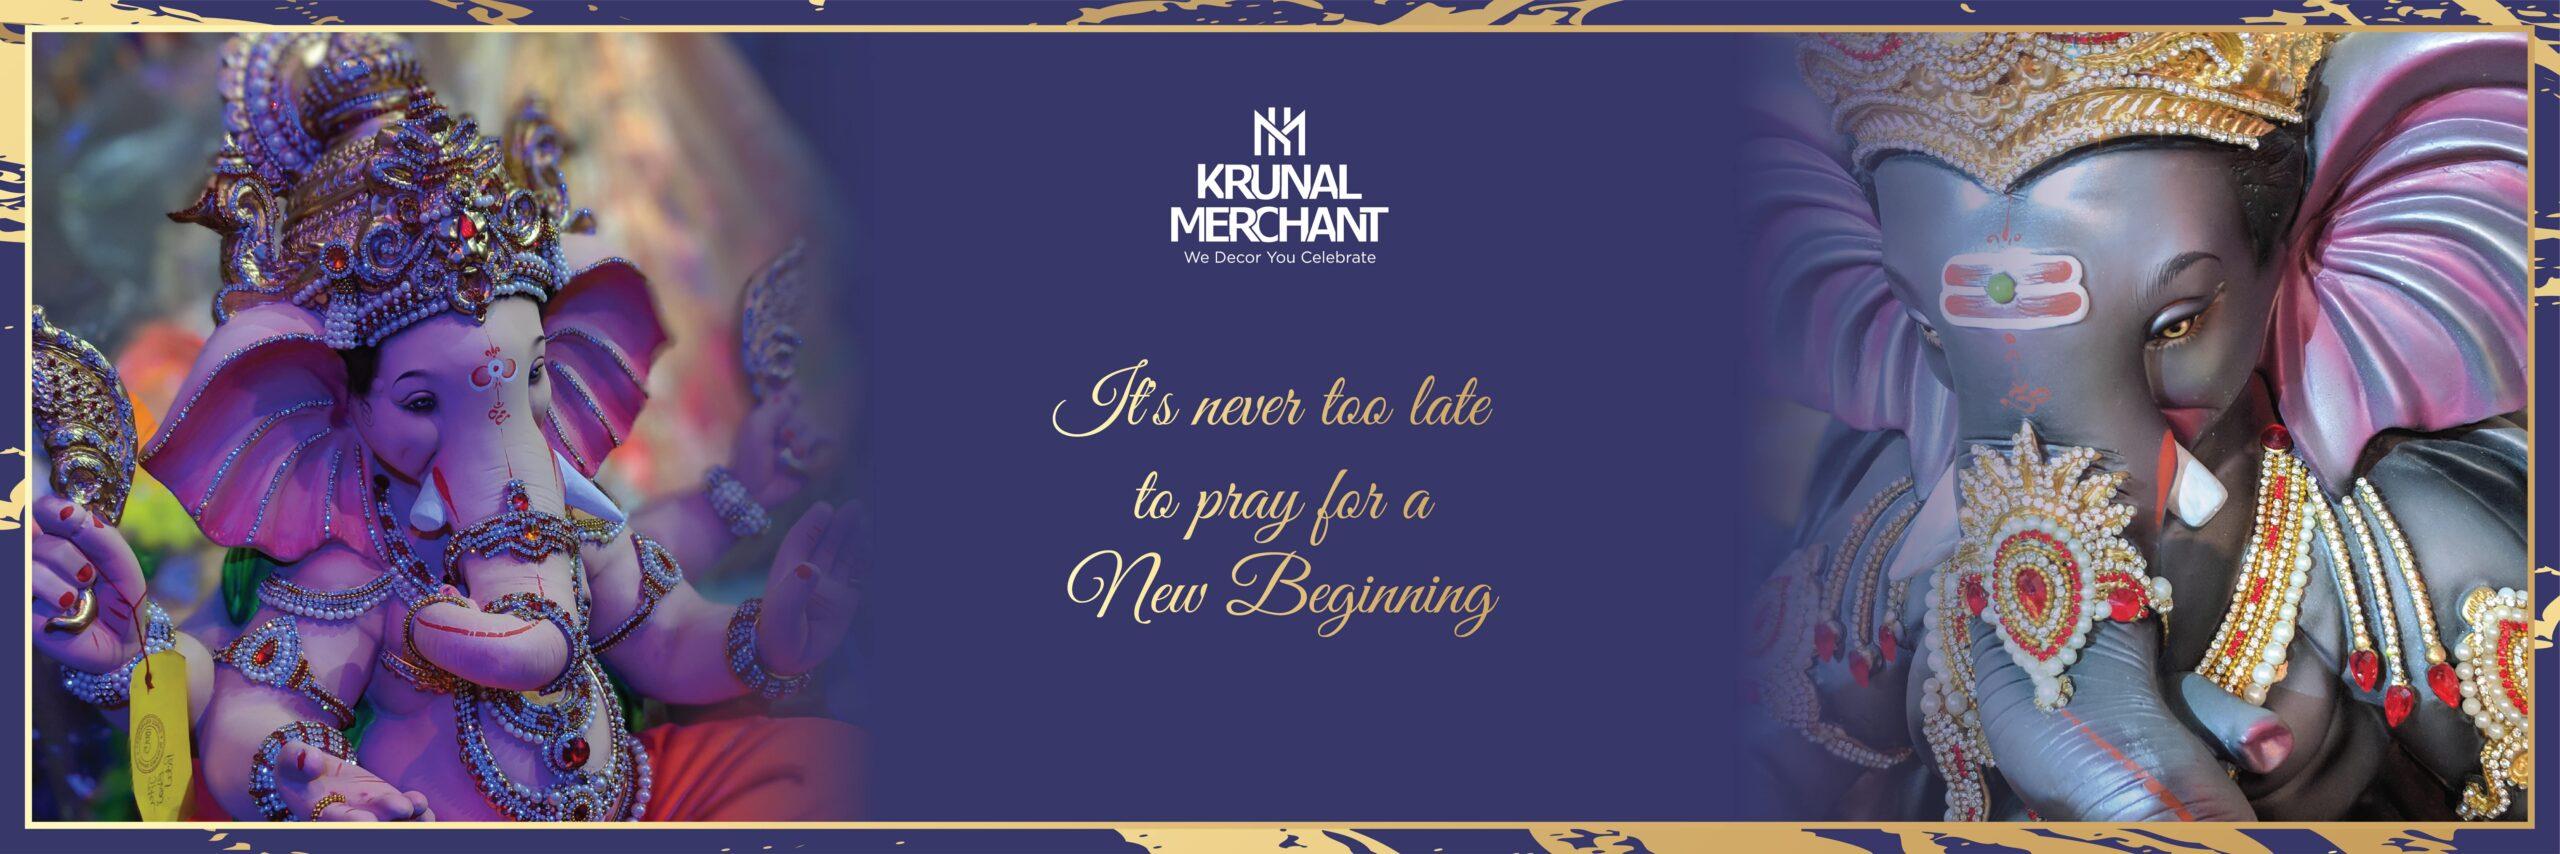 Krunal Merchant_30 June-01-min